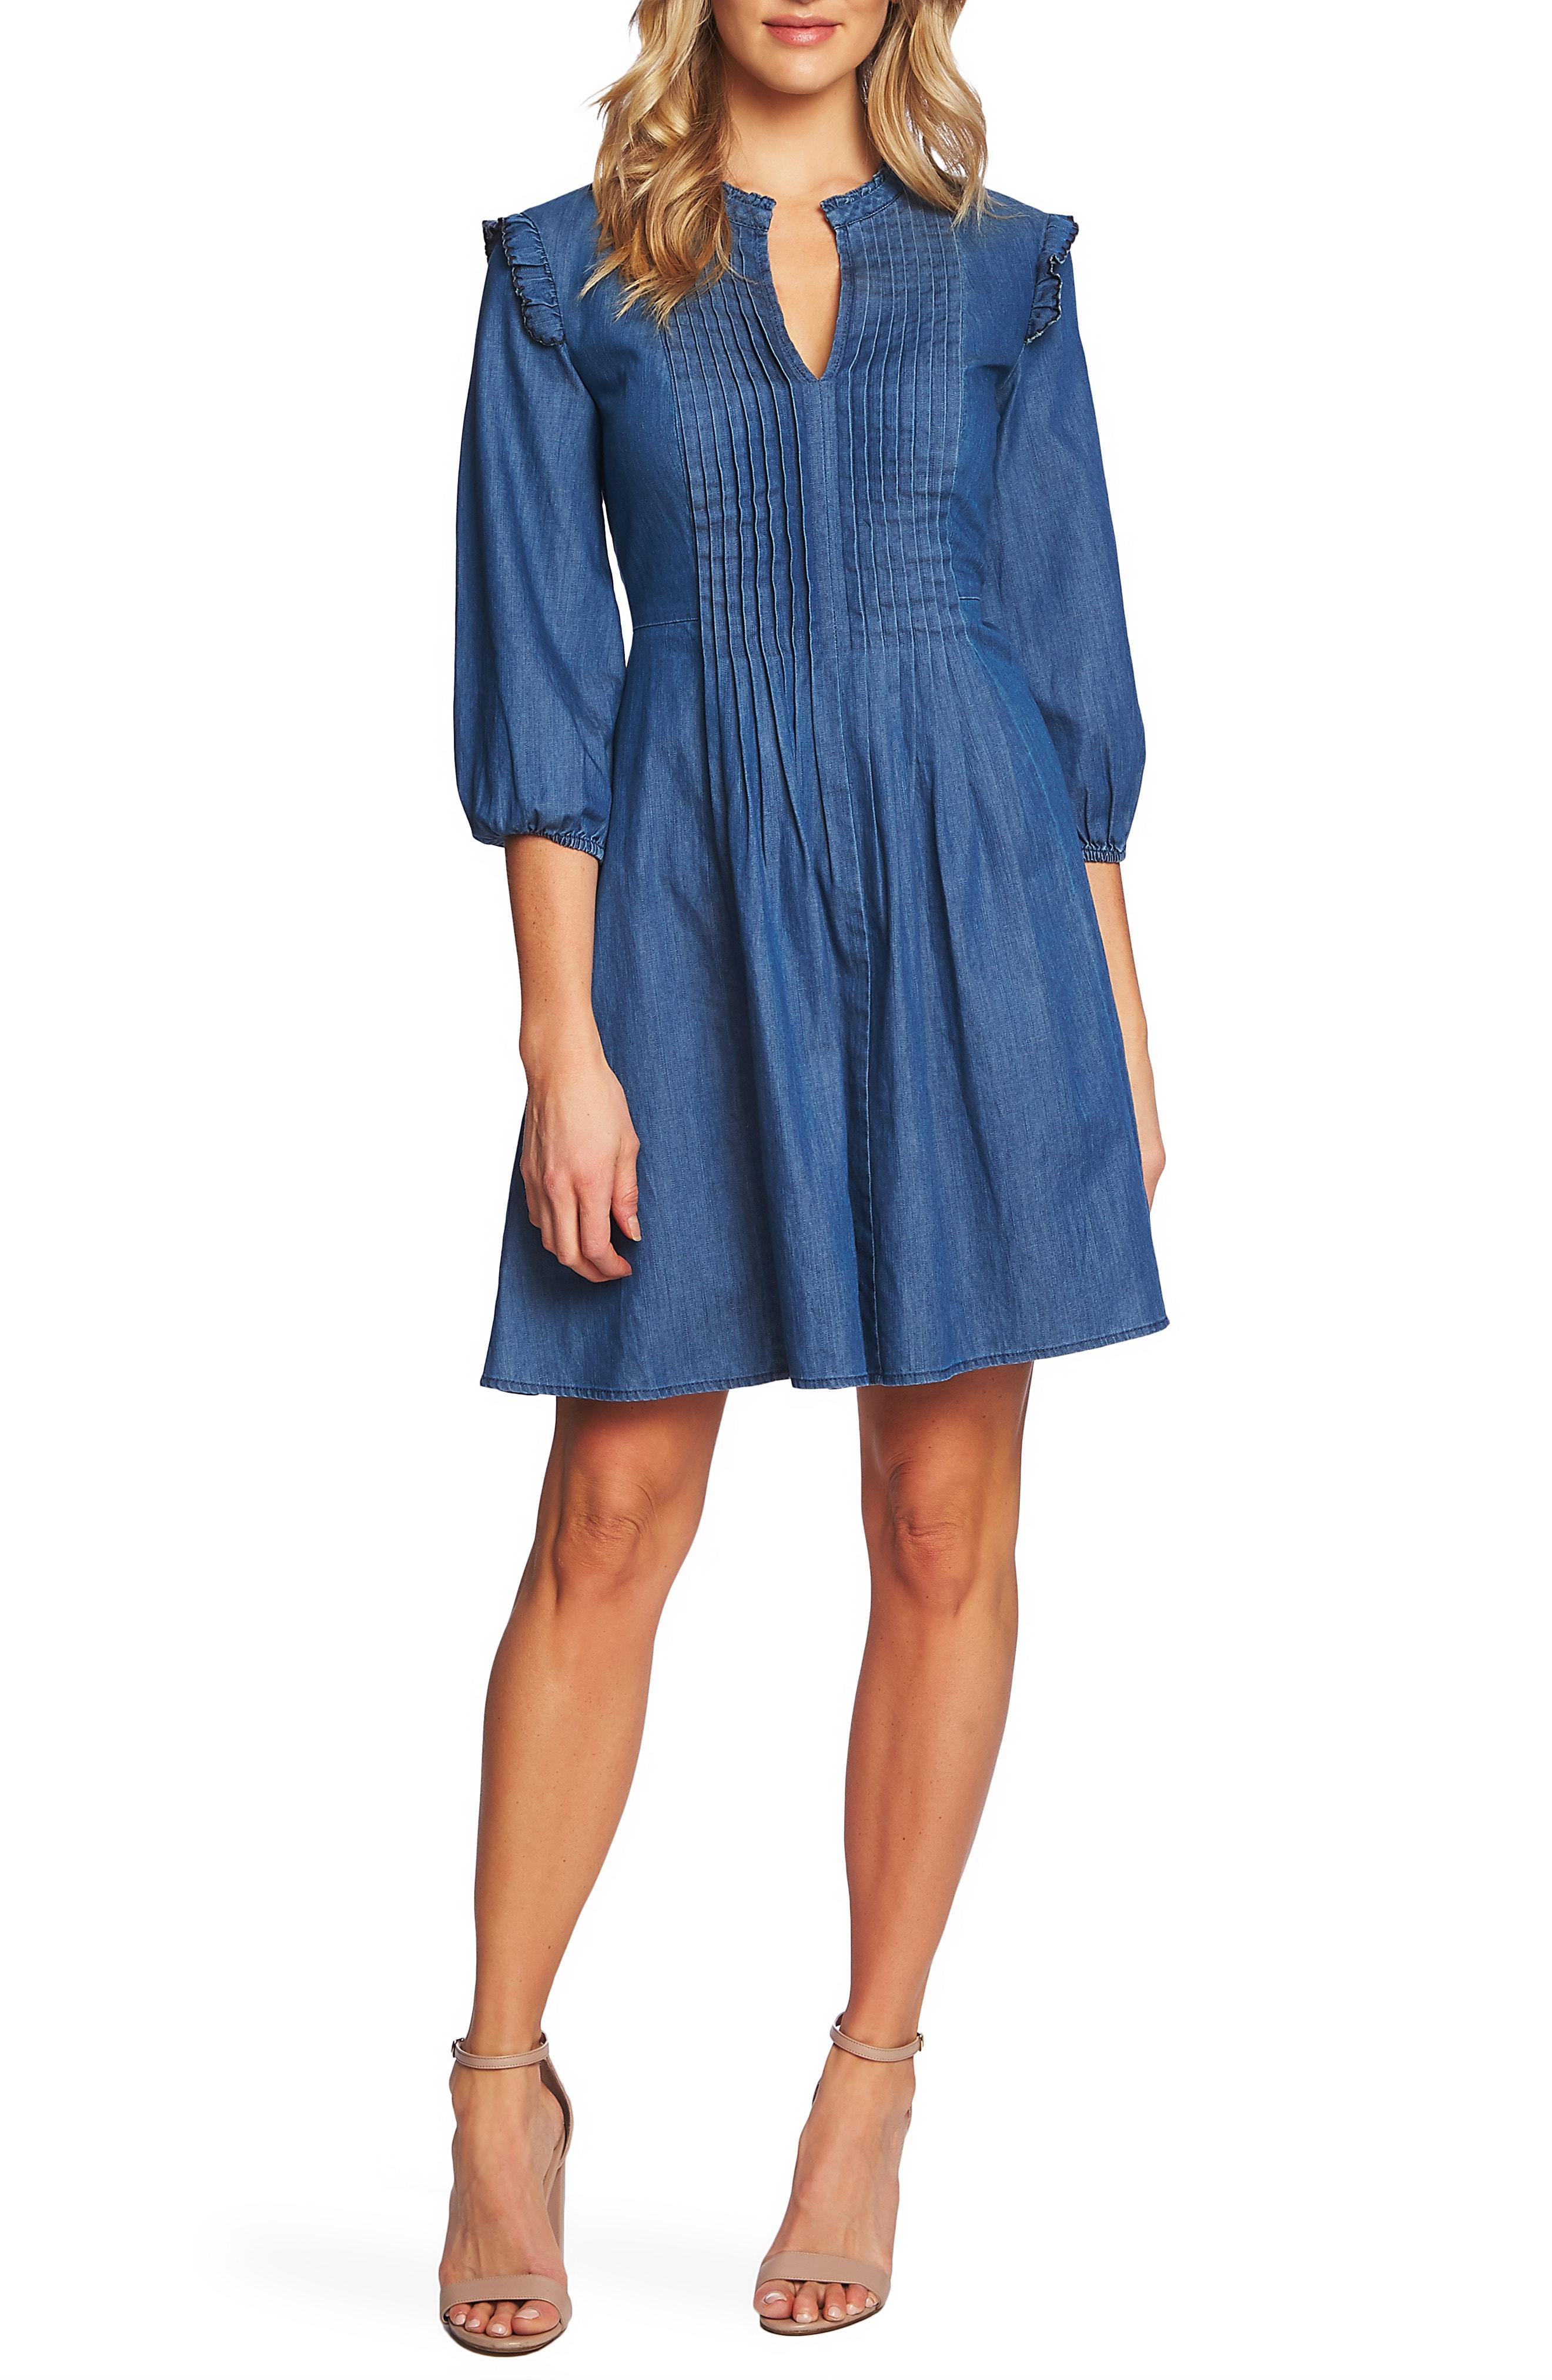 denim dresses | Nordstrom